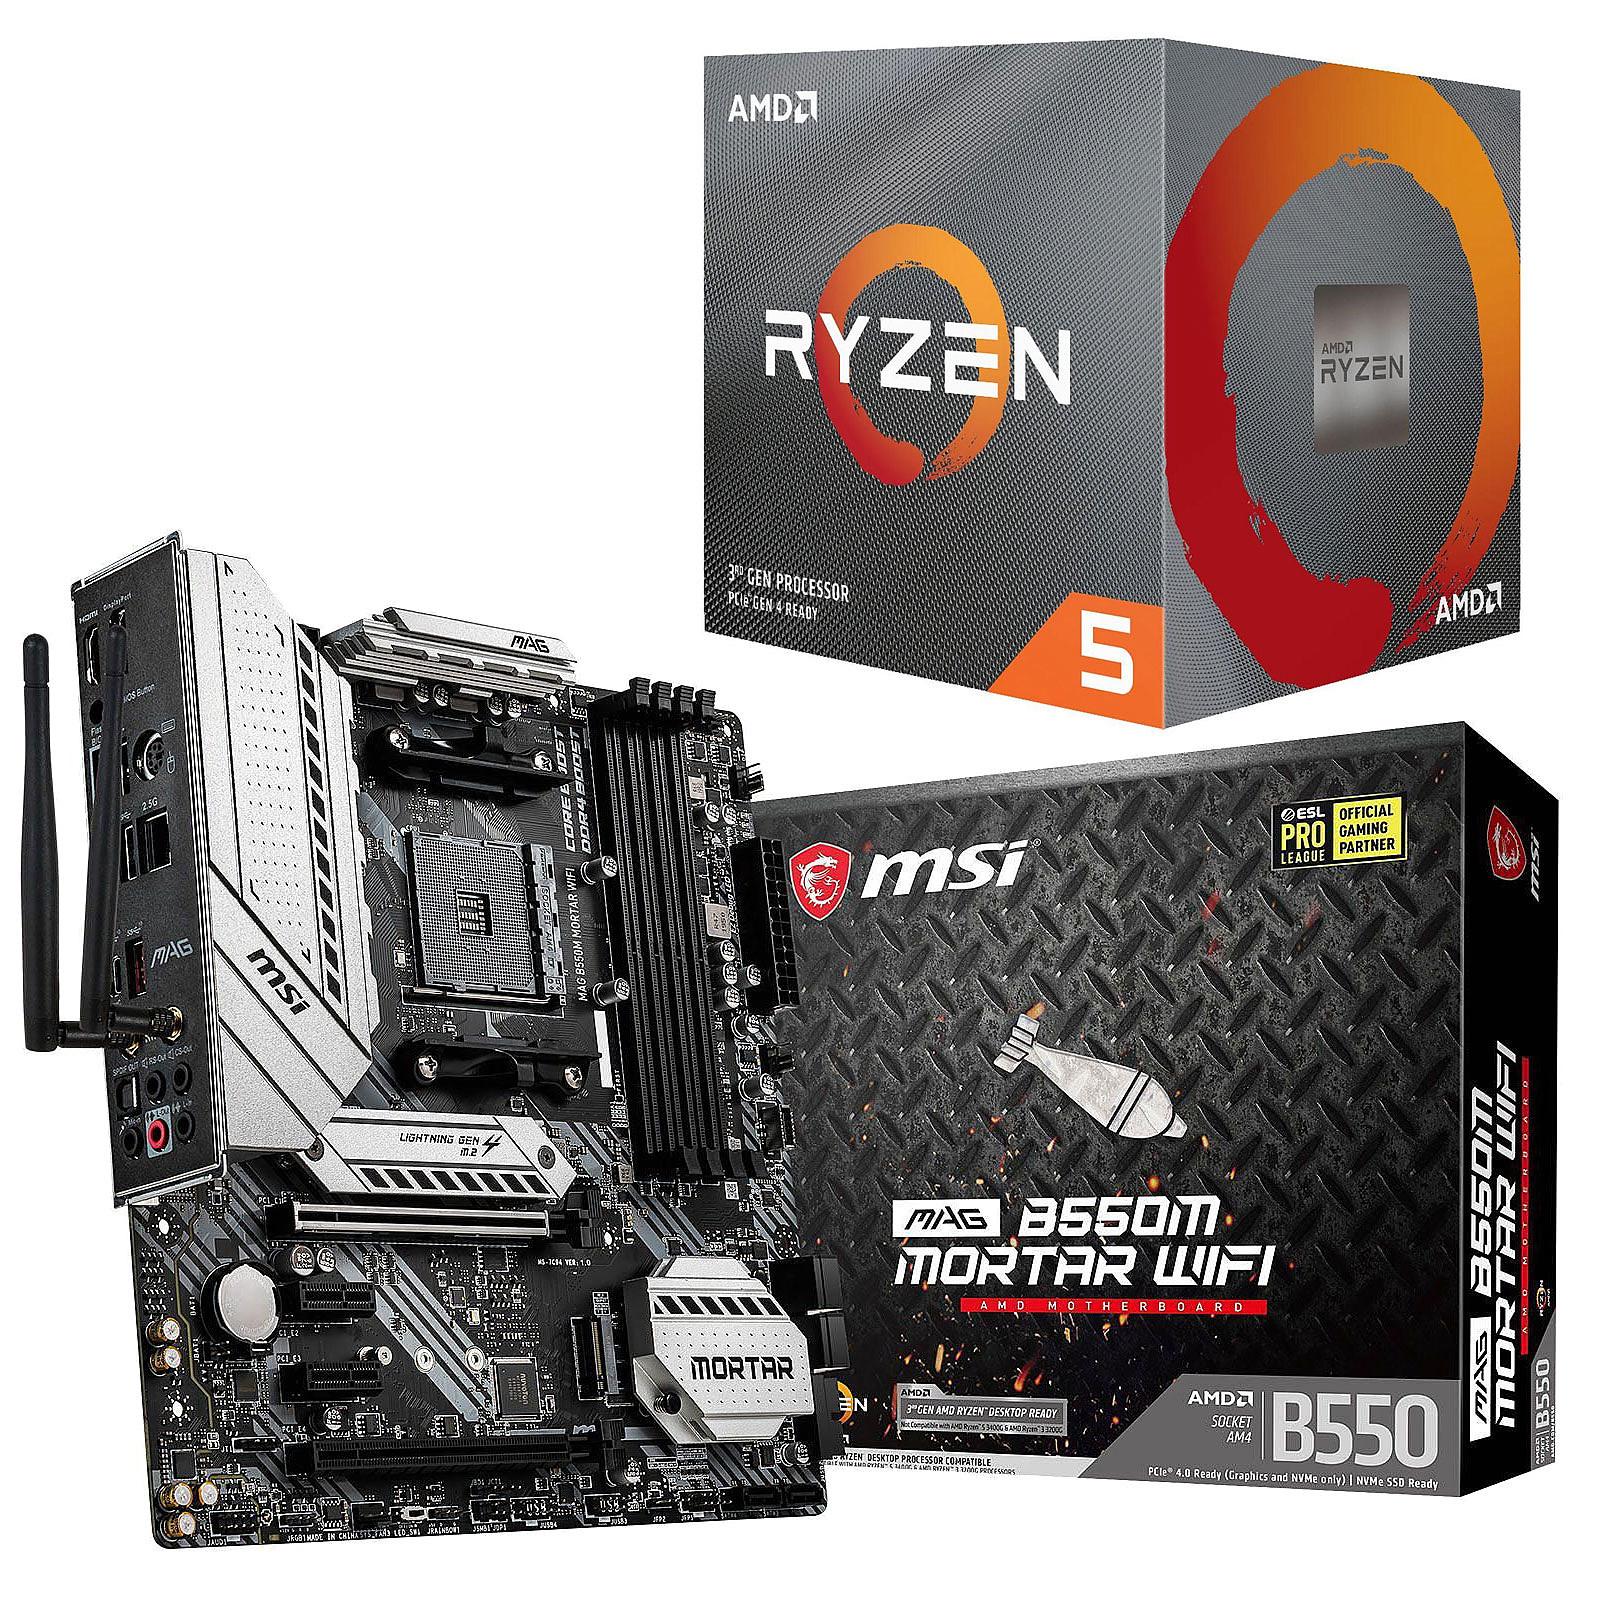 Kit Upgrade PC AMD Ryzen 5 3600X MSI MAG B550M MORTAR WIFI